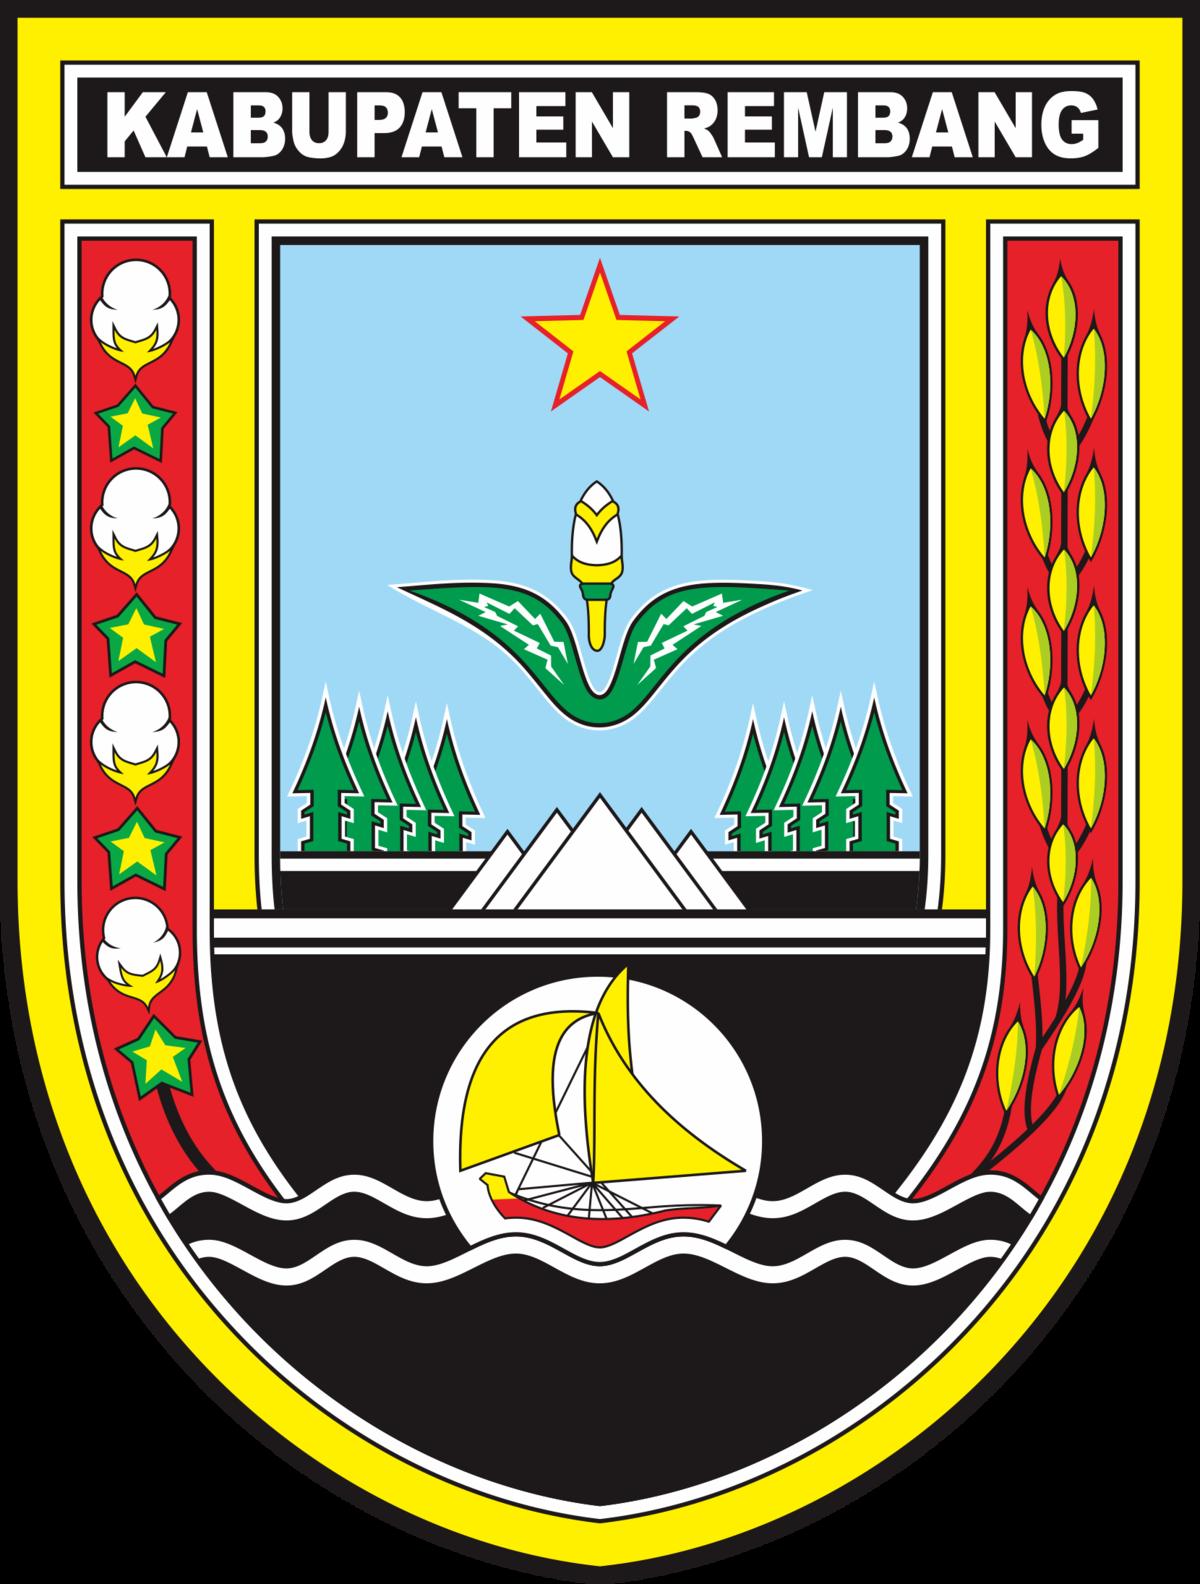 Kabupaten Rembang Wikipedia Bahasa Indonesia Ensiklopedia Bebas Taman Wisata Alam